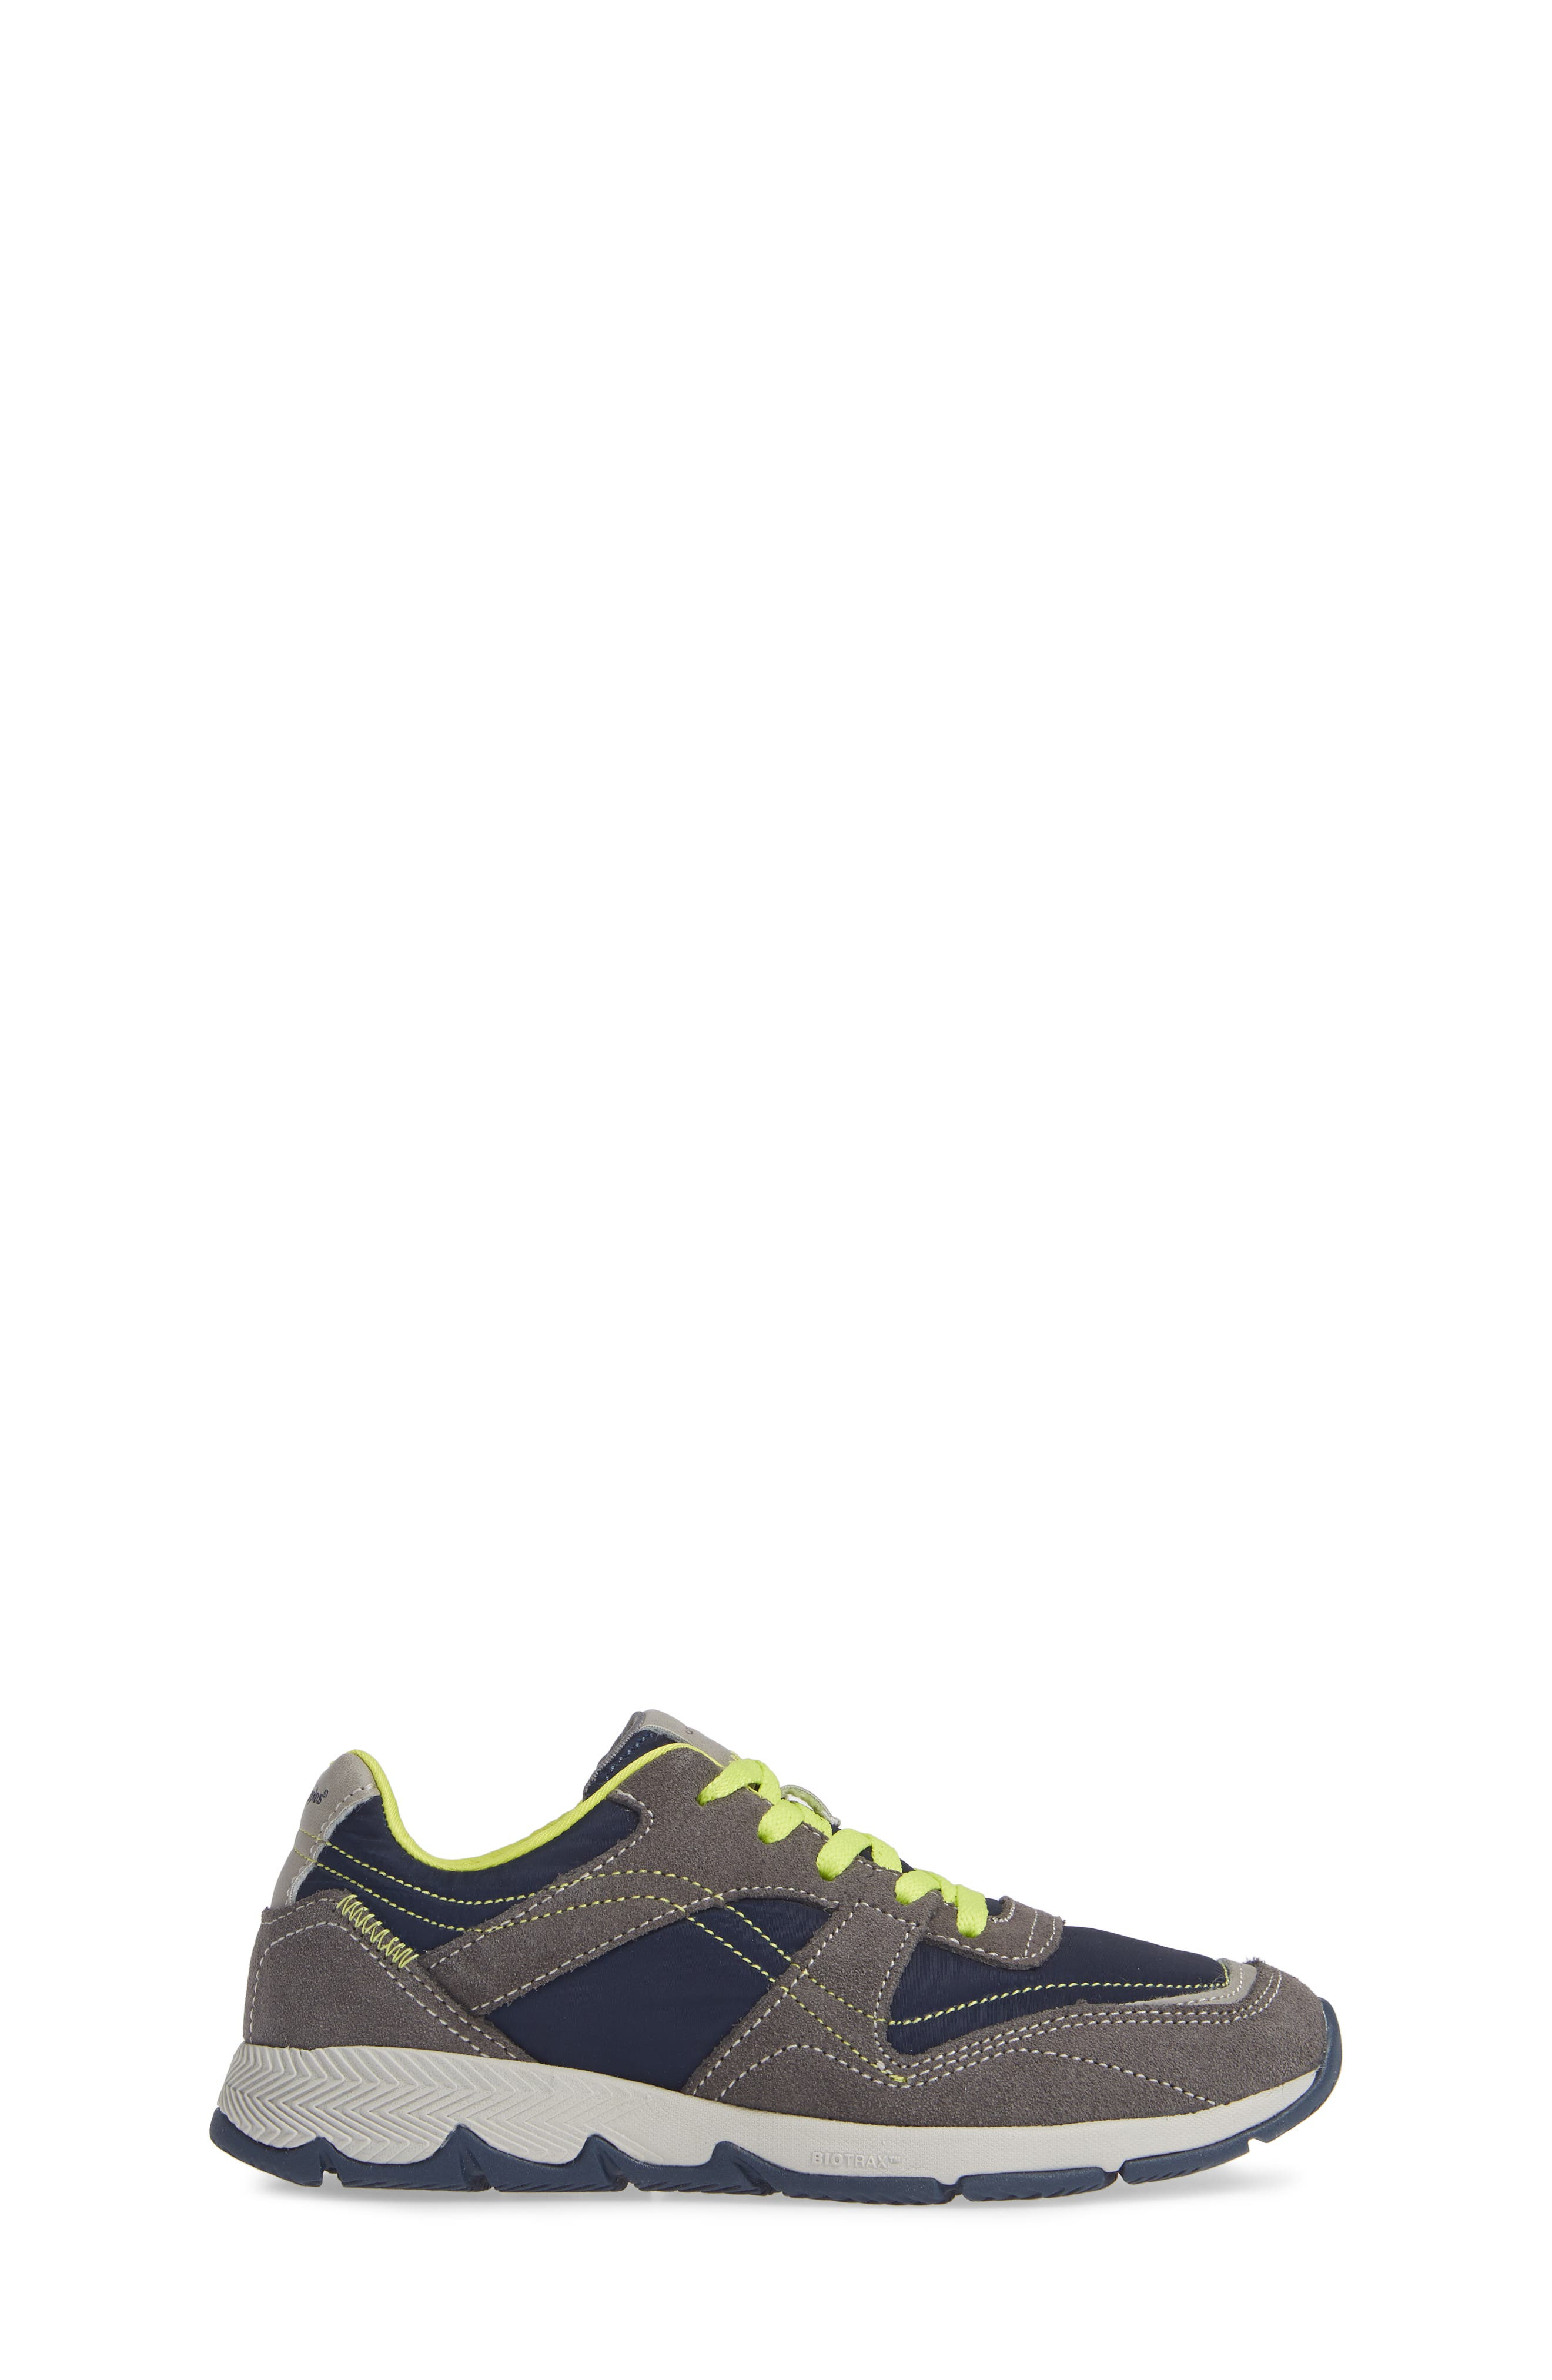 Zev TS Field Sneaker,                             Alternate thumbnail 3, color,                             GREY/ NAVY